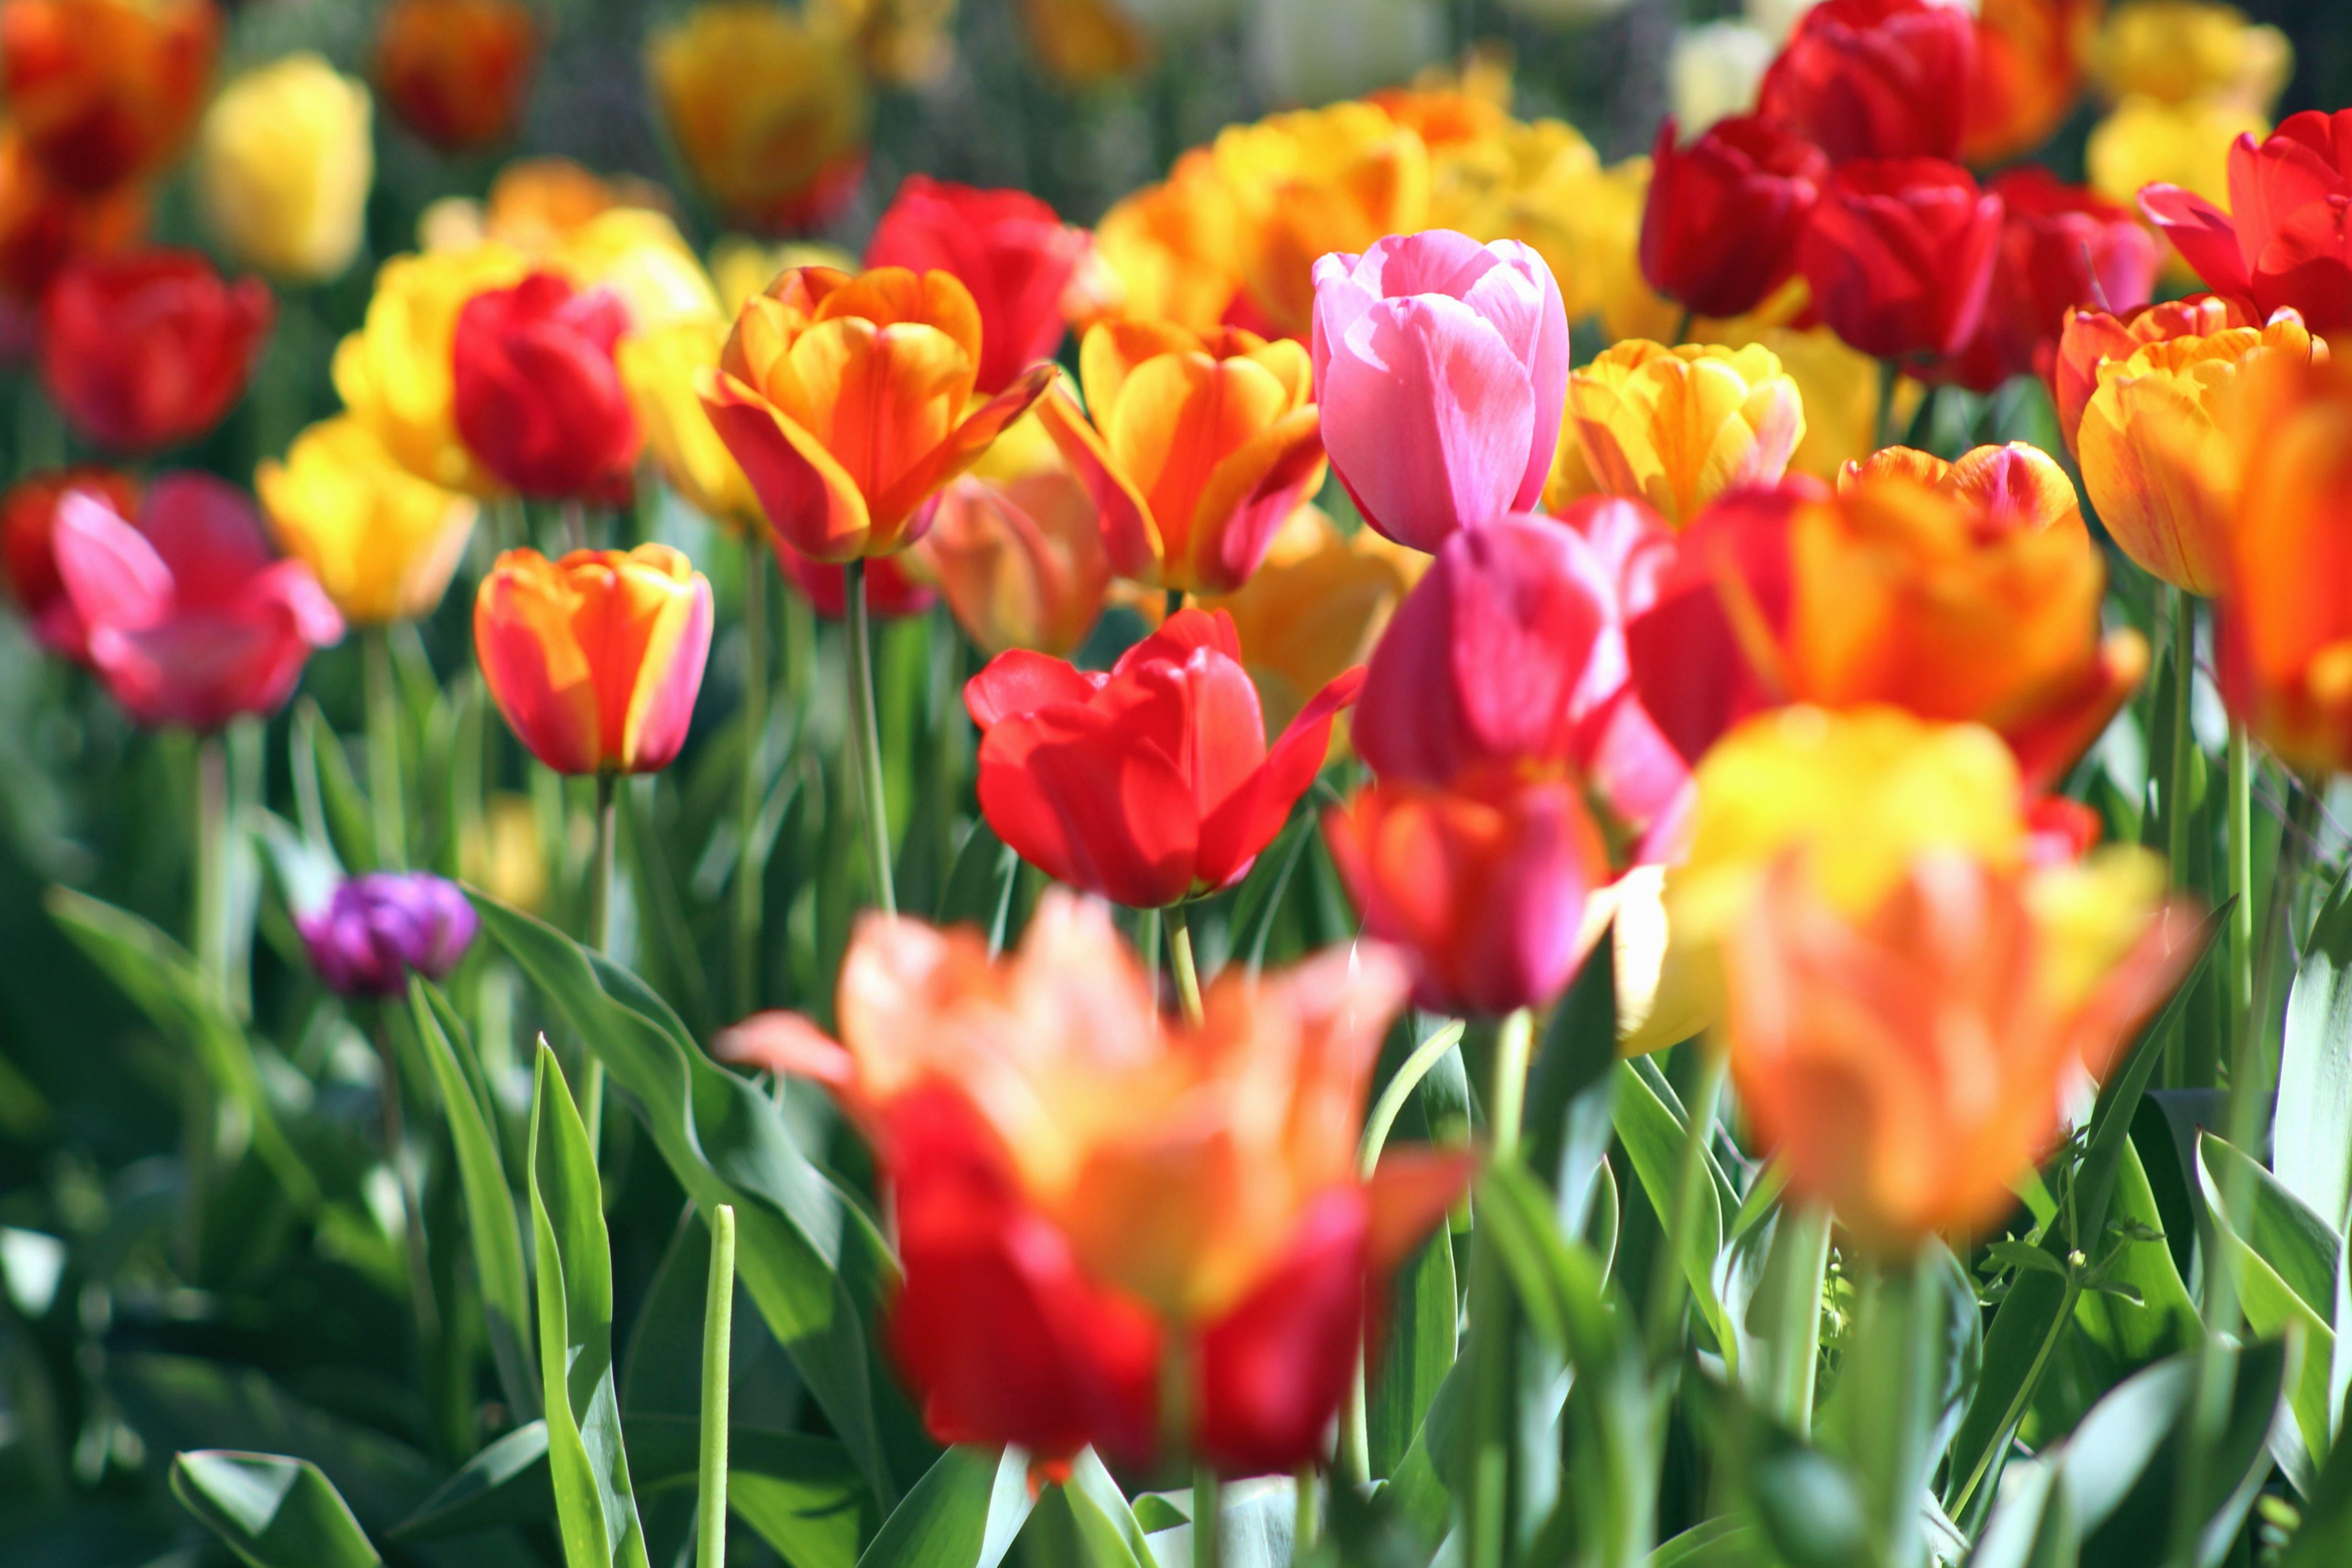 Kostenlose Bild: Feld, Frühling, Tulpen, Bunt, Garten